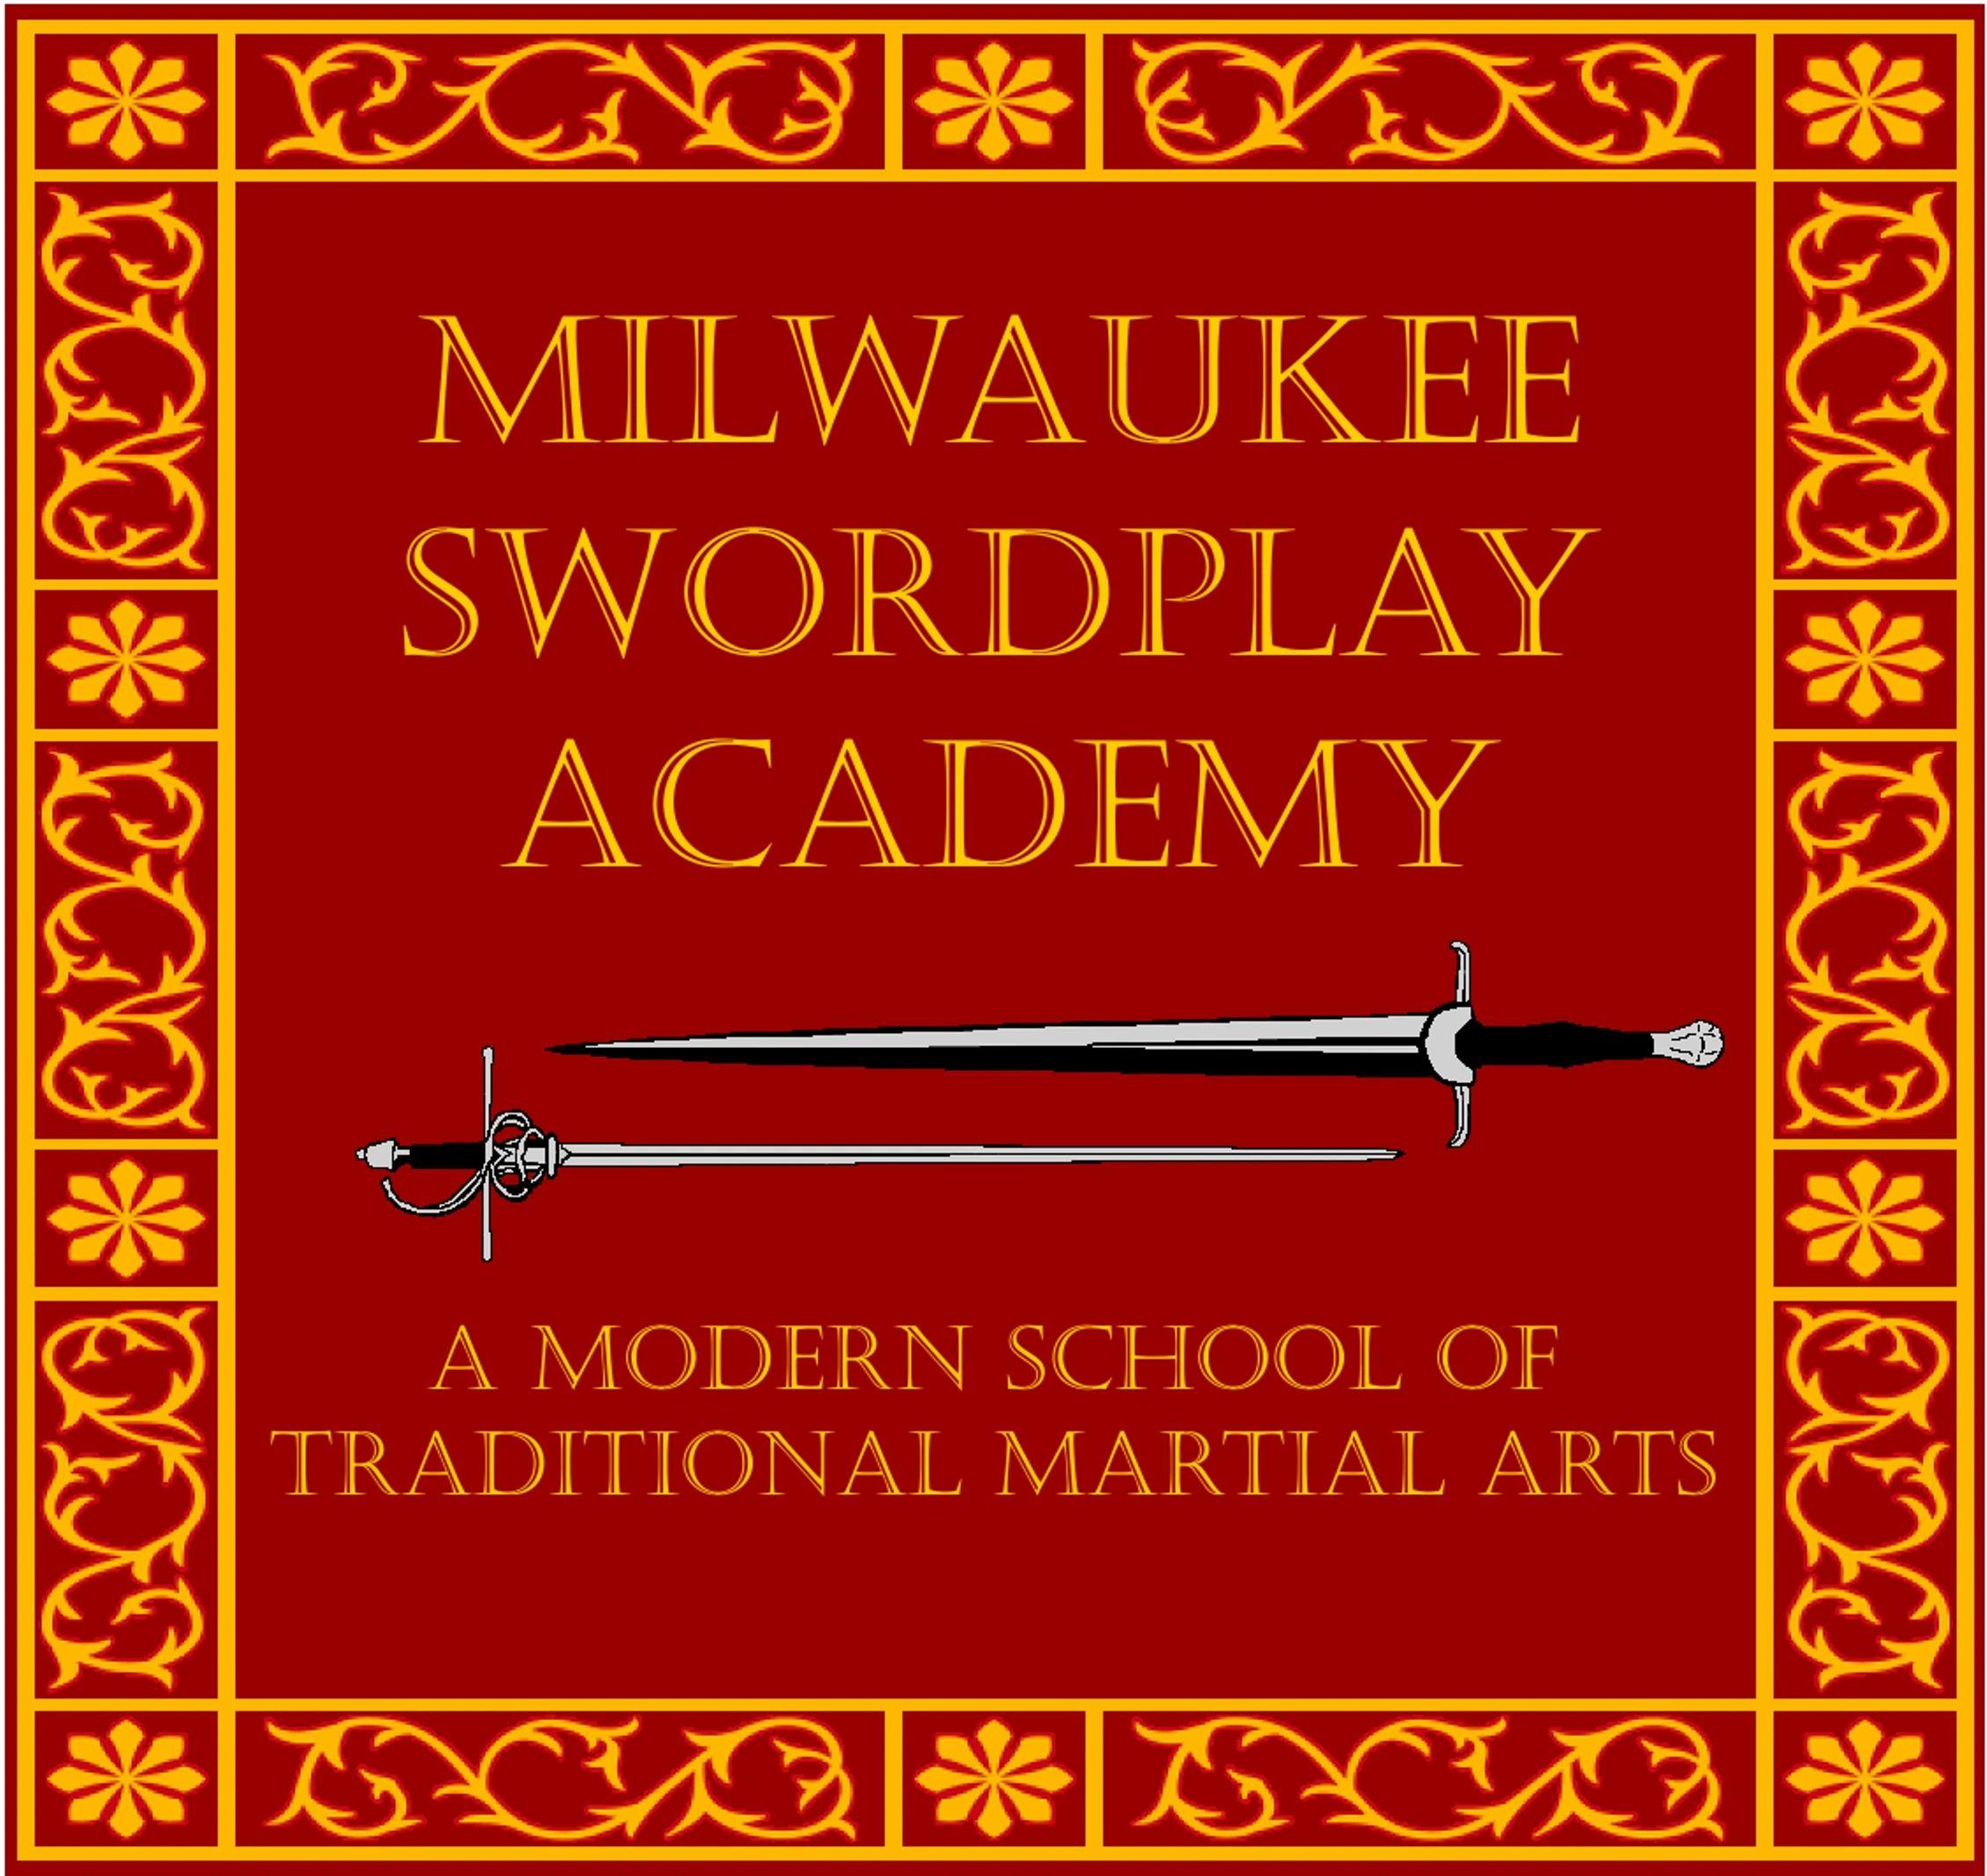 Milwaukee Swordplay Academy